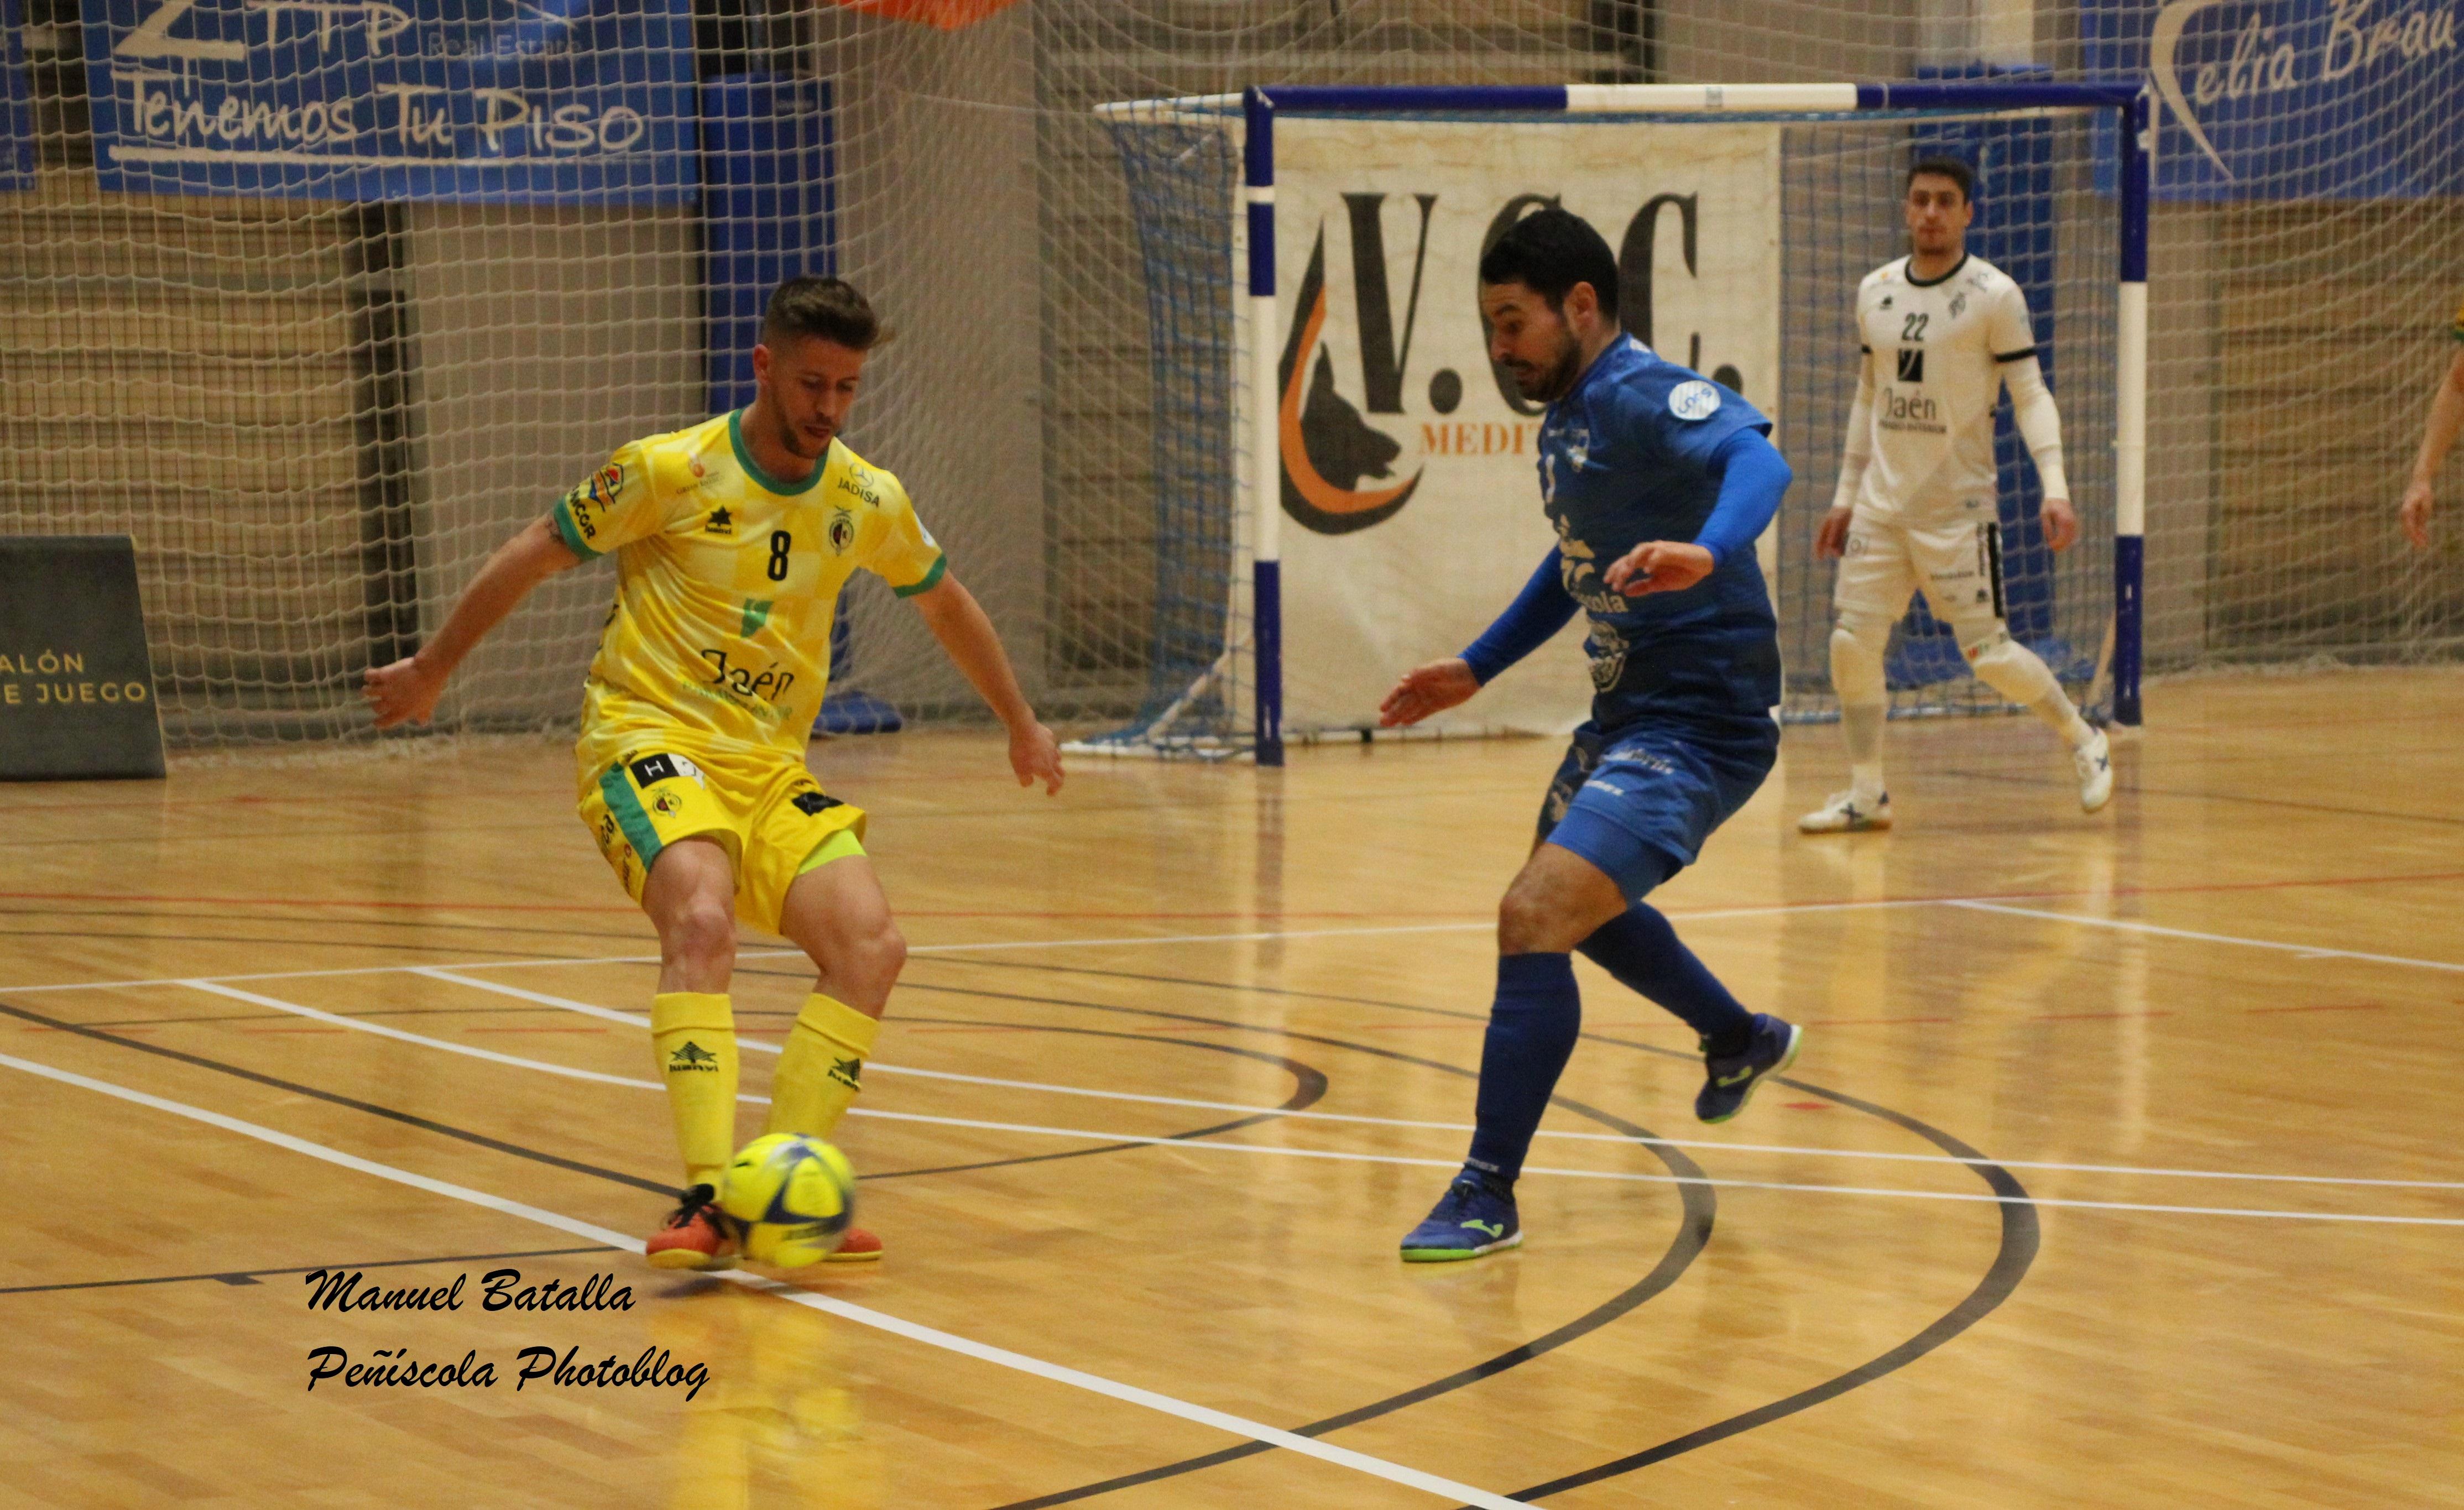 Al Servigroup Peníscola se li escapa la victòria en l'últim minut (3-3)